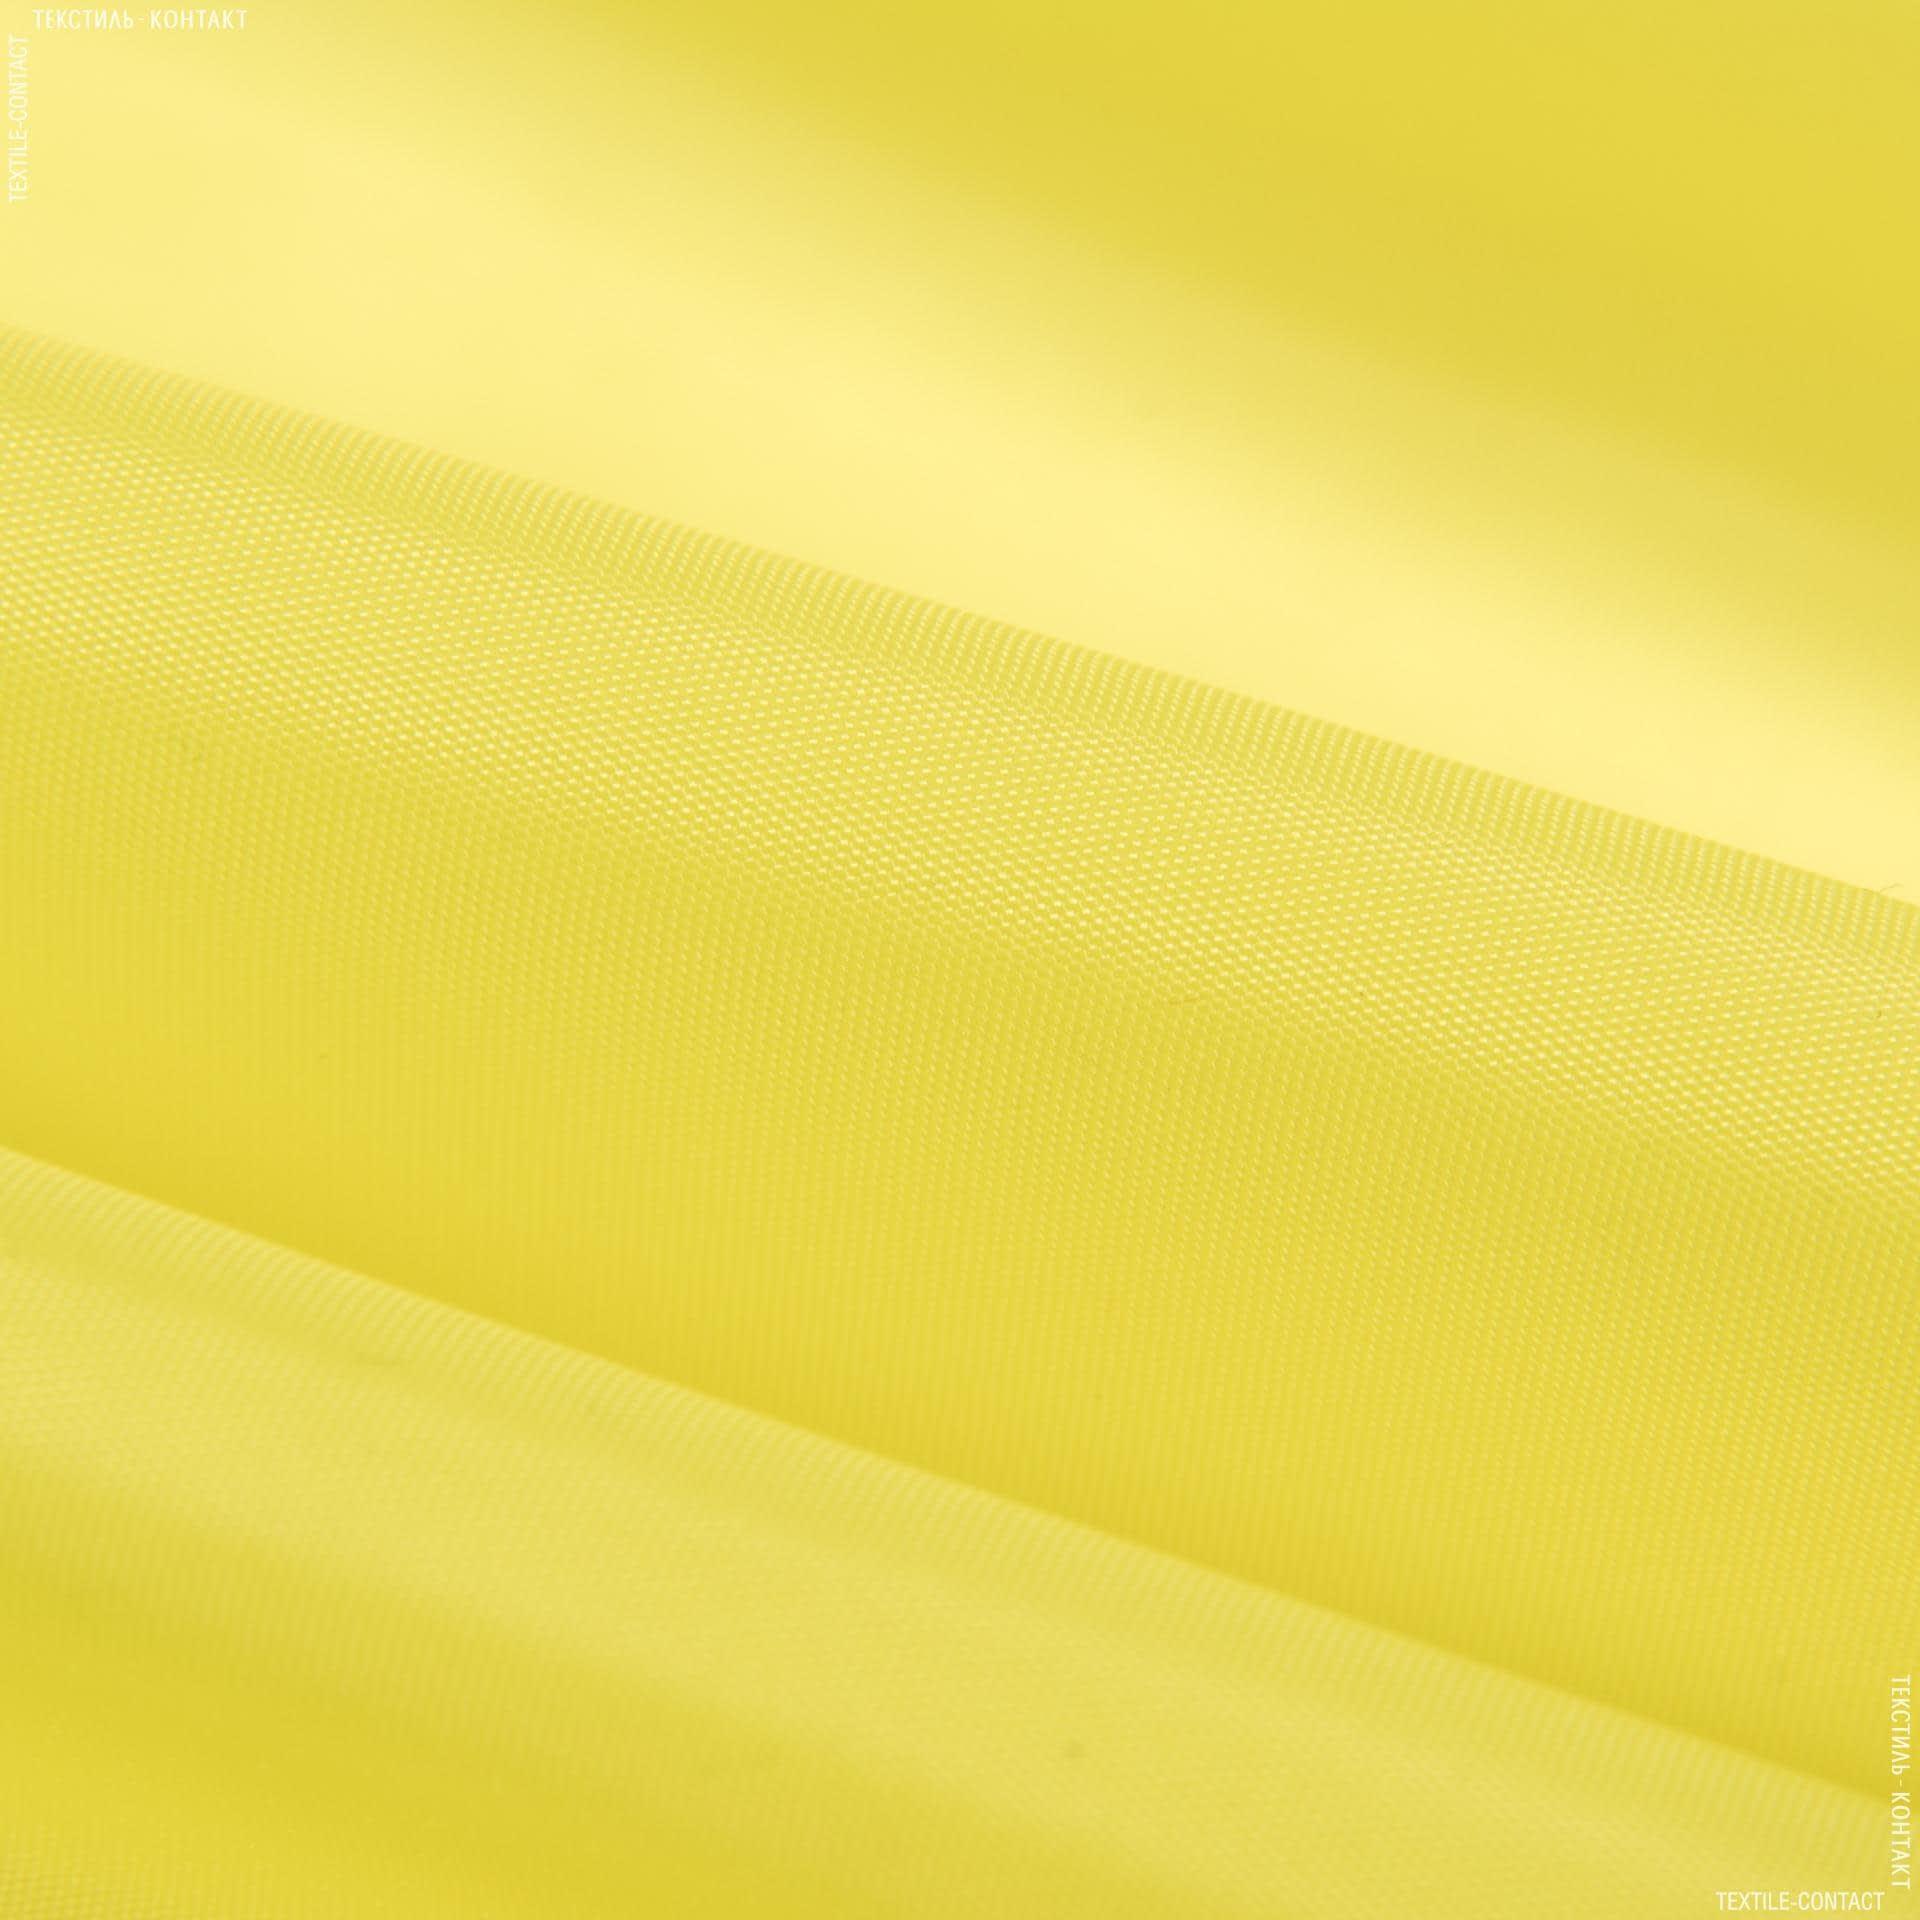 Ткани подкладочная ткань - Подкладочная 190т желто-лимонный